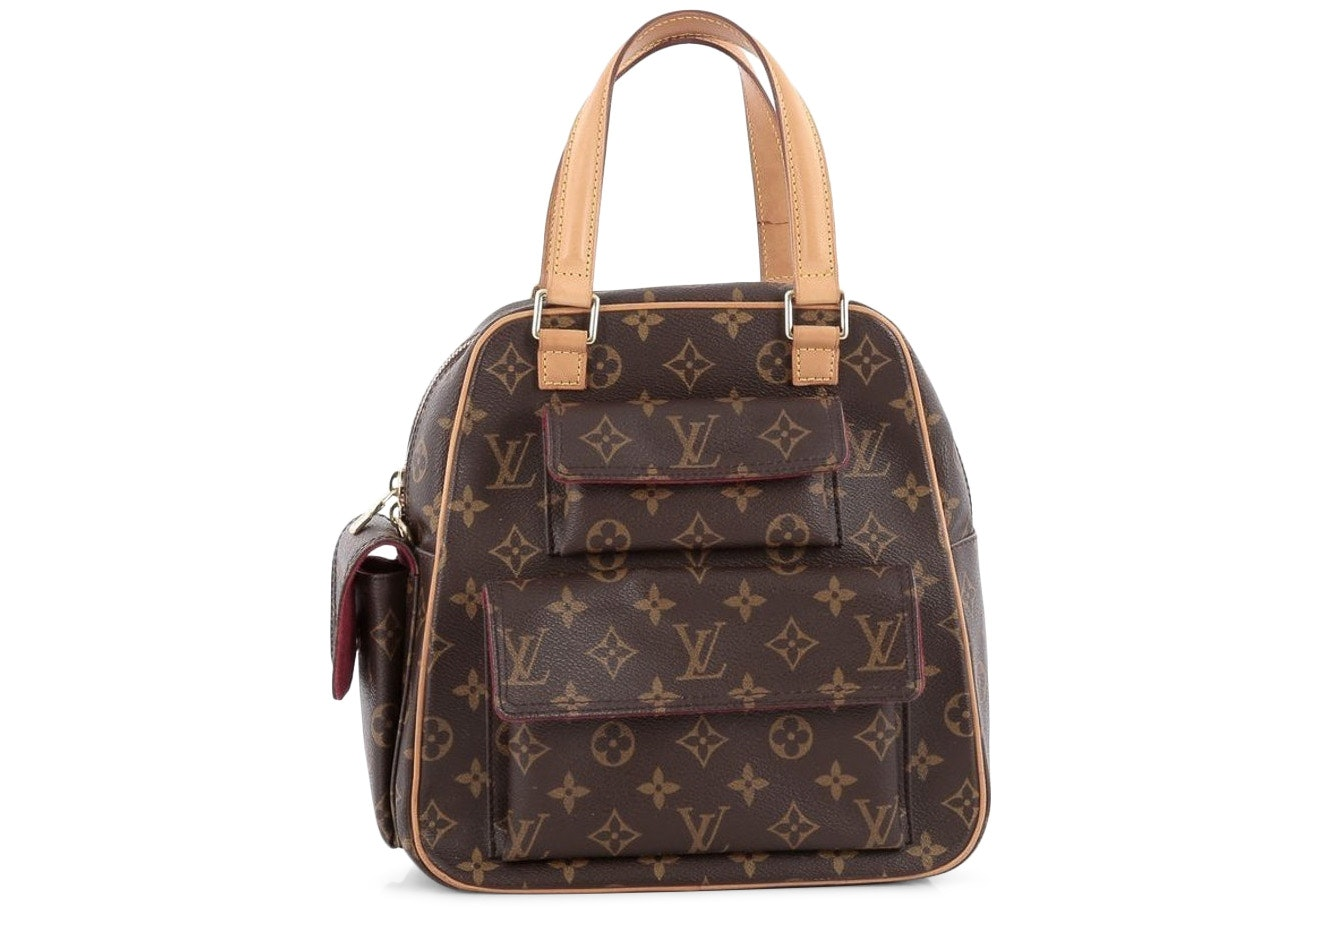 Louis Vuitton Excentri-Cite Monogram Brown